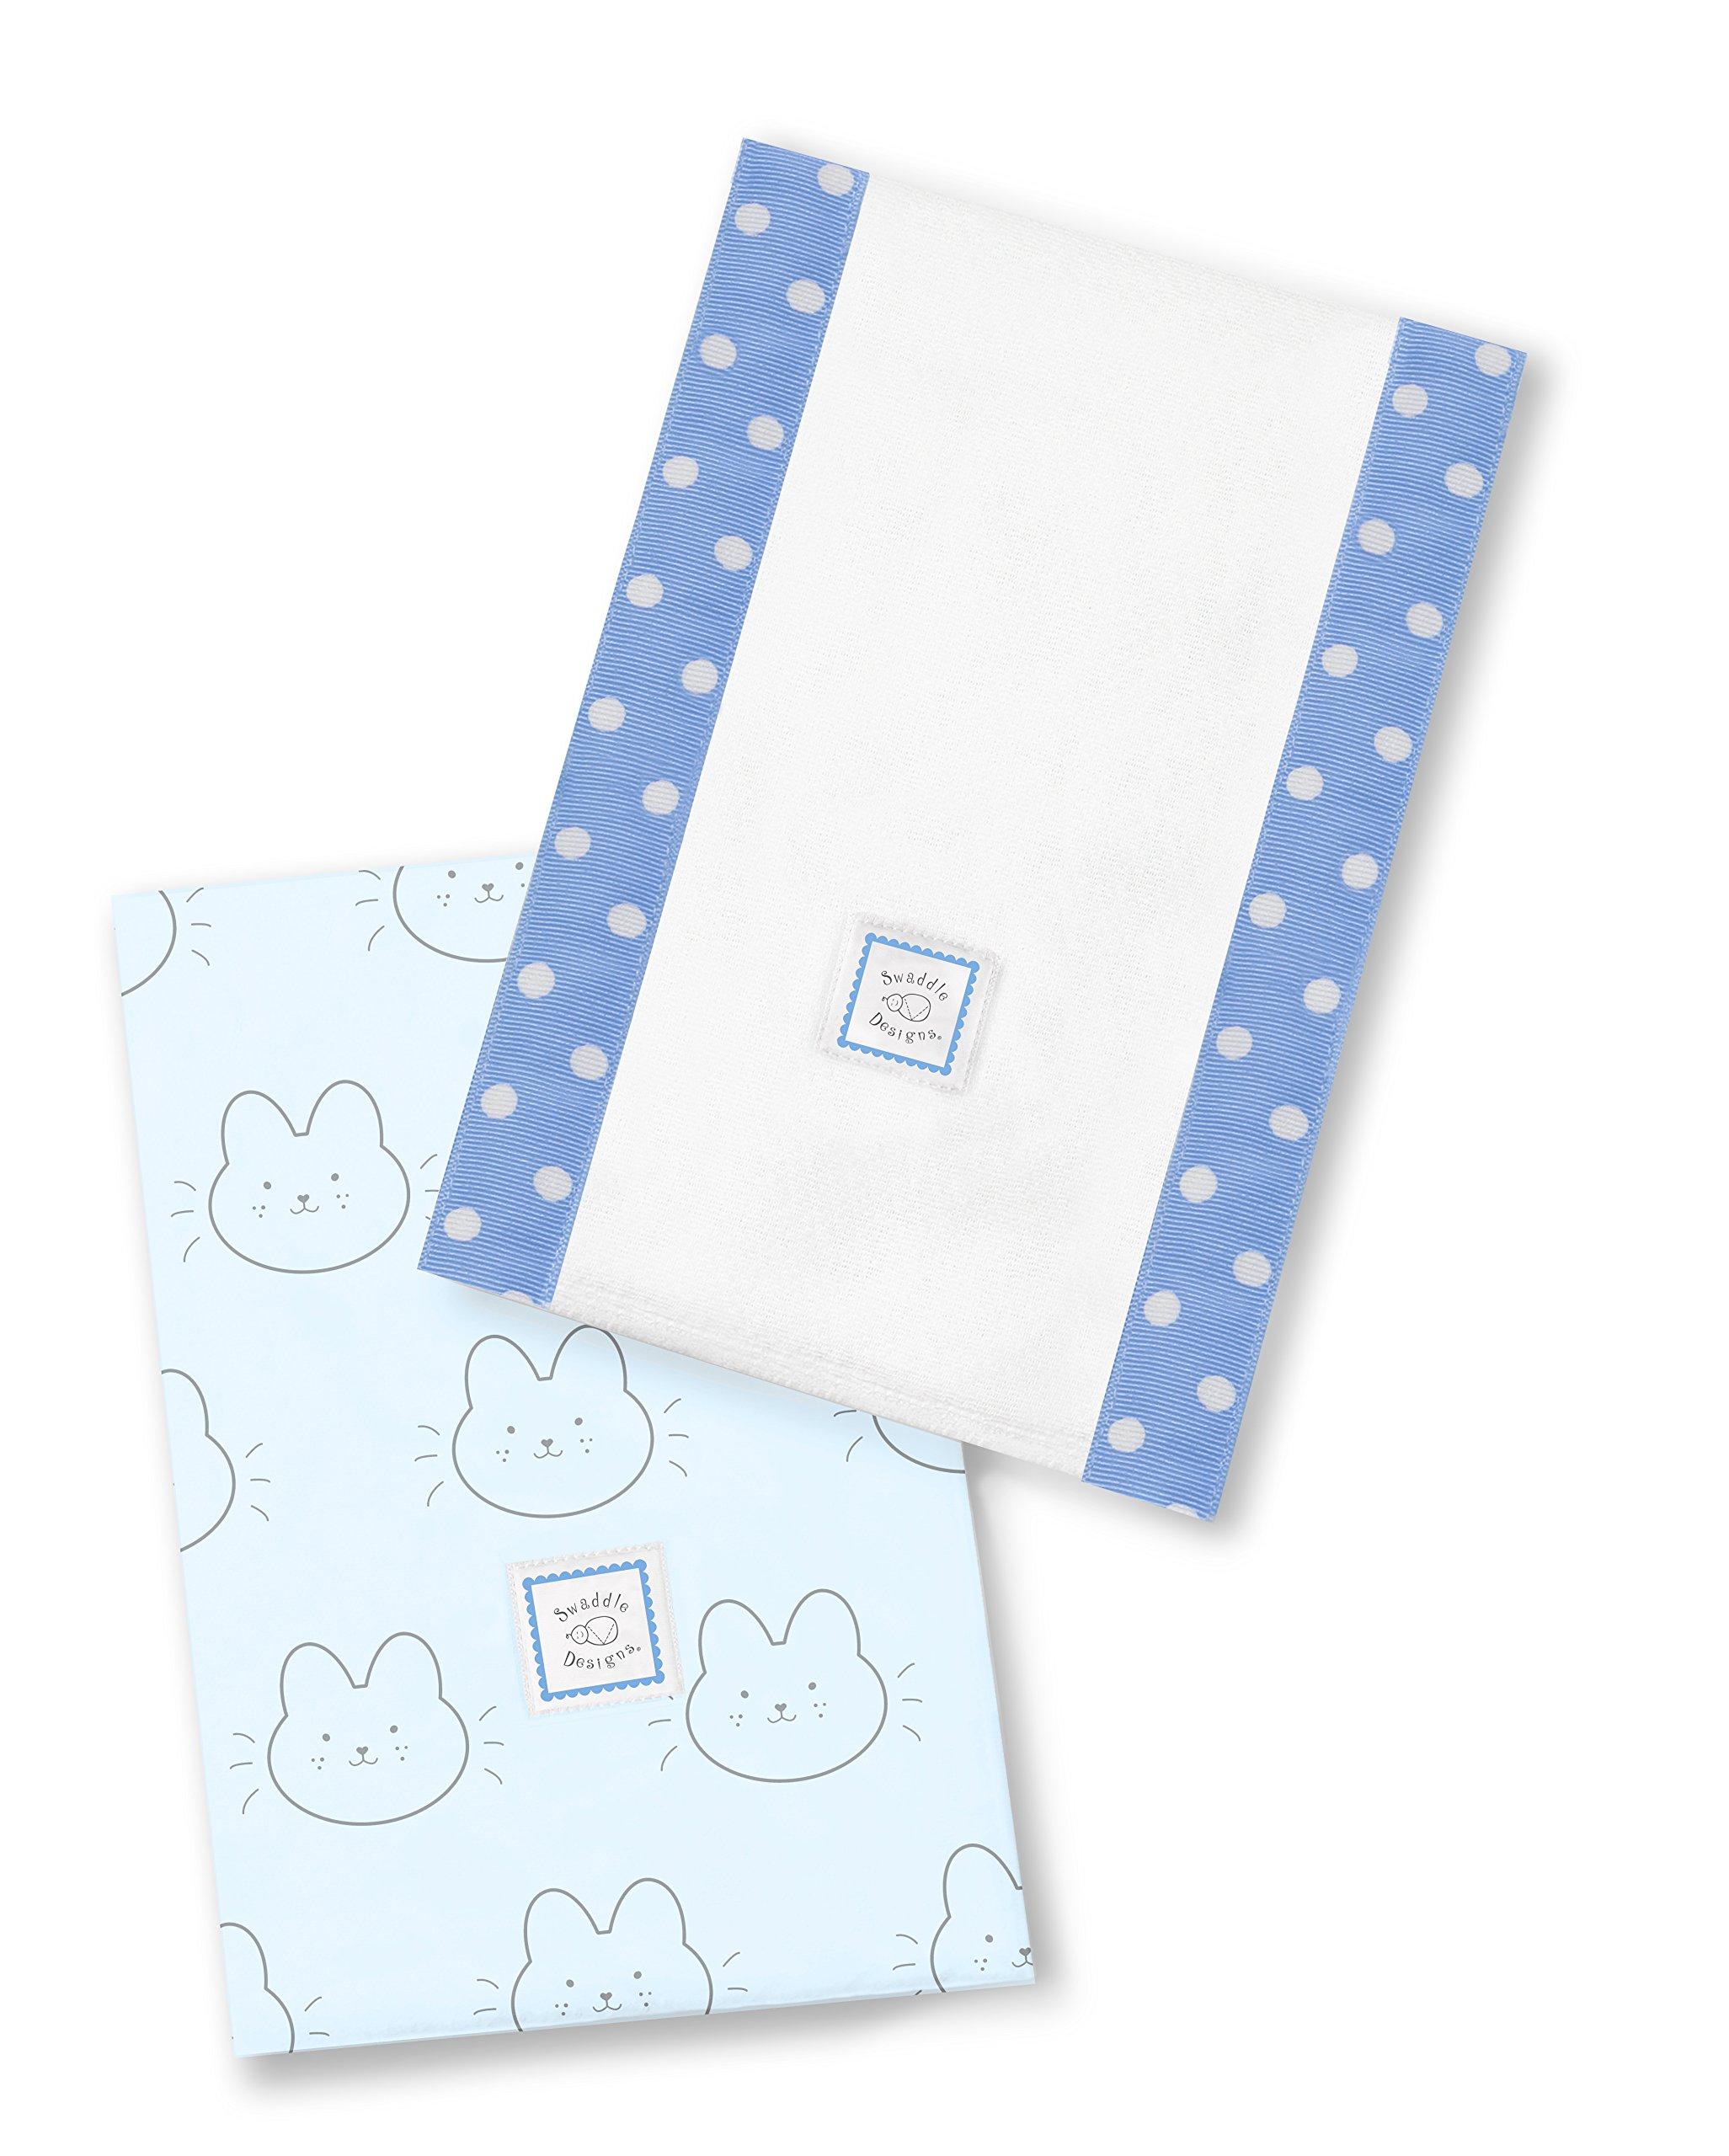 SwaddleDesigns Baby Burpies, Set of 2 Cotton Burp Cloths, Bonjour Bunnie on Blue